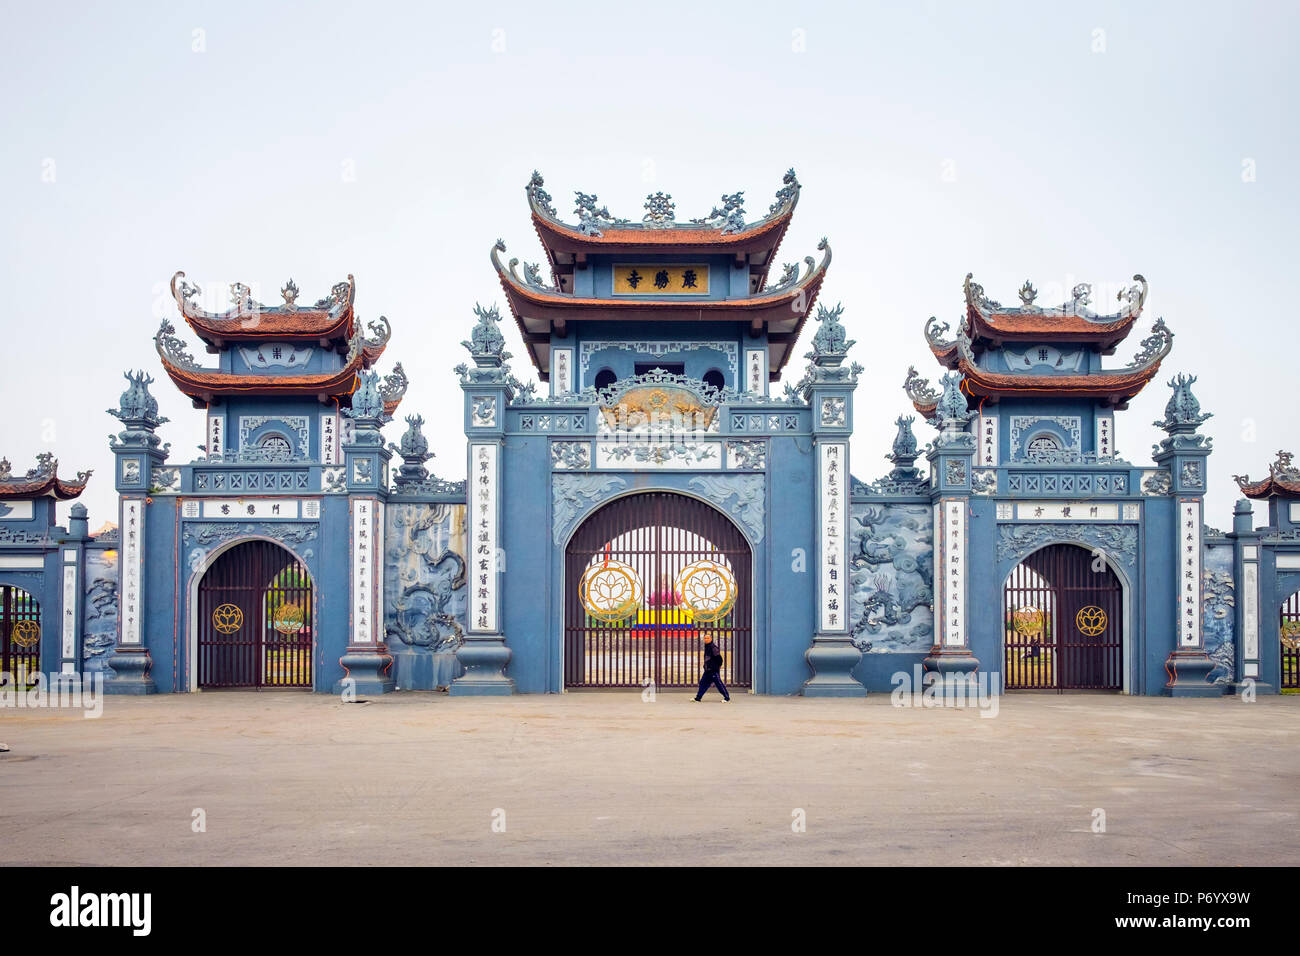 Gate of Chua Trinh Pagoda, Uong Bi, Quang Ninh Province, Vietnam Stock Photo